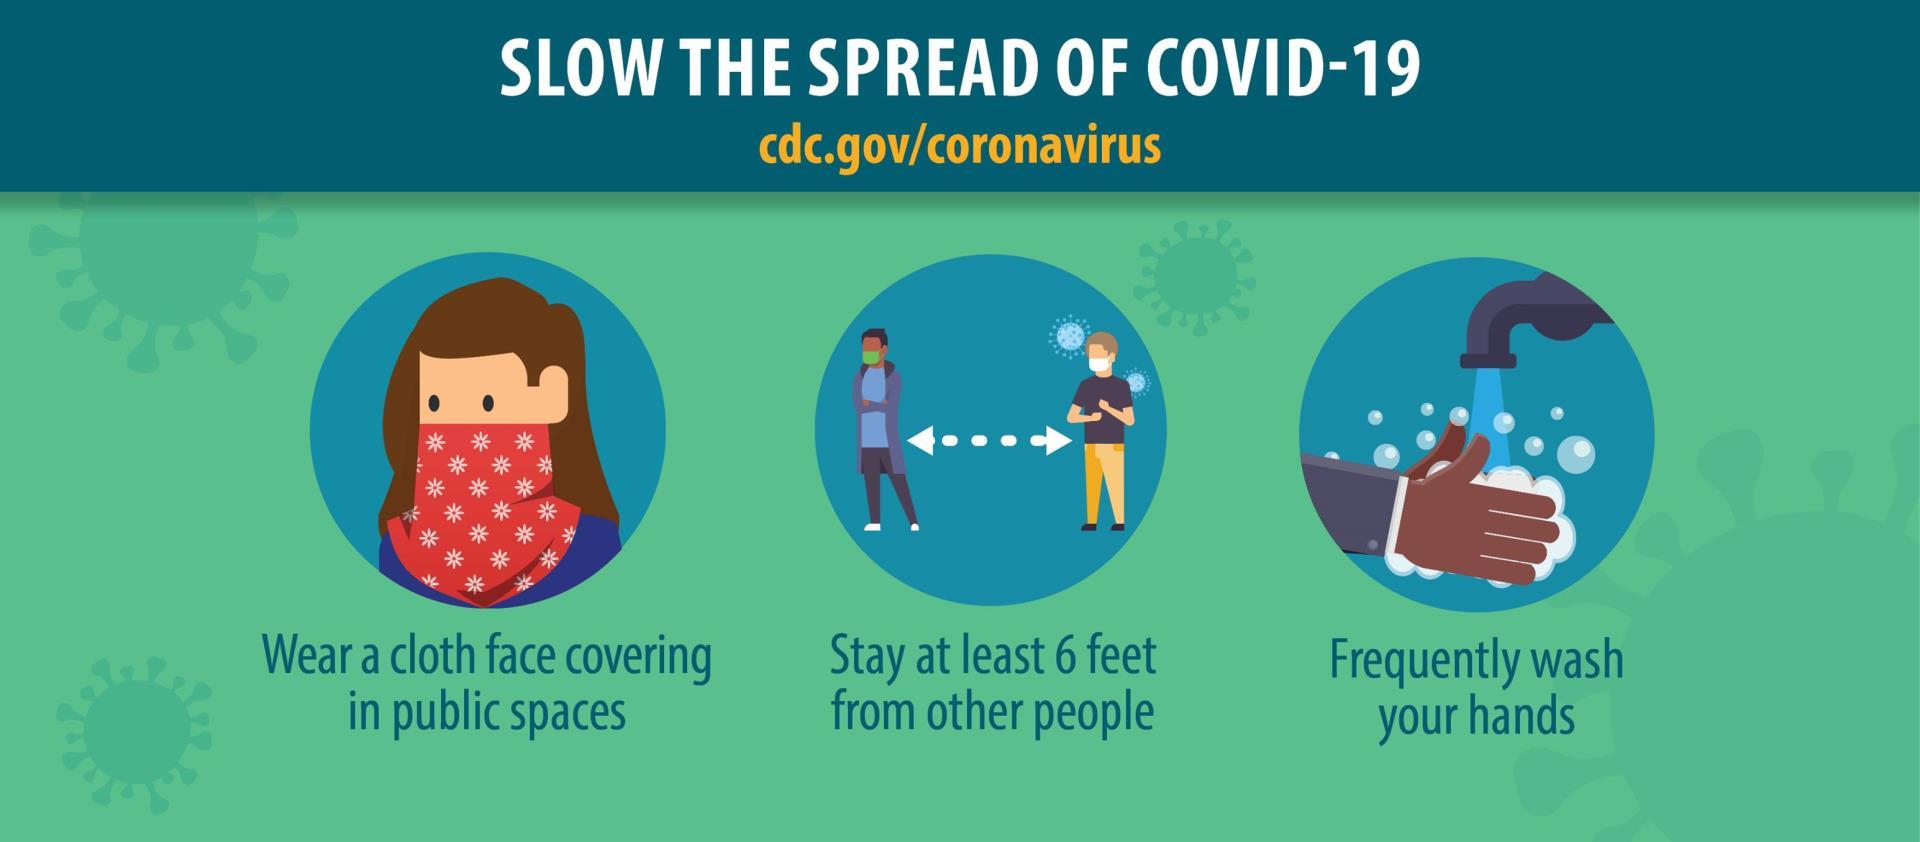 Food Safety and the Coronavirus Disease 2019 (COVID-19) - FDA